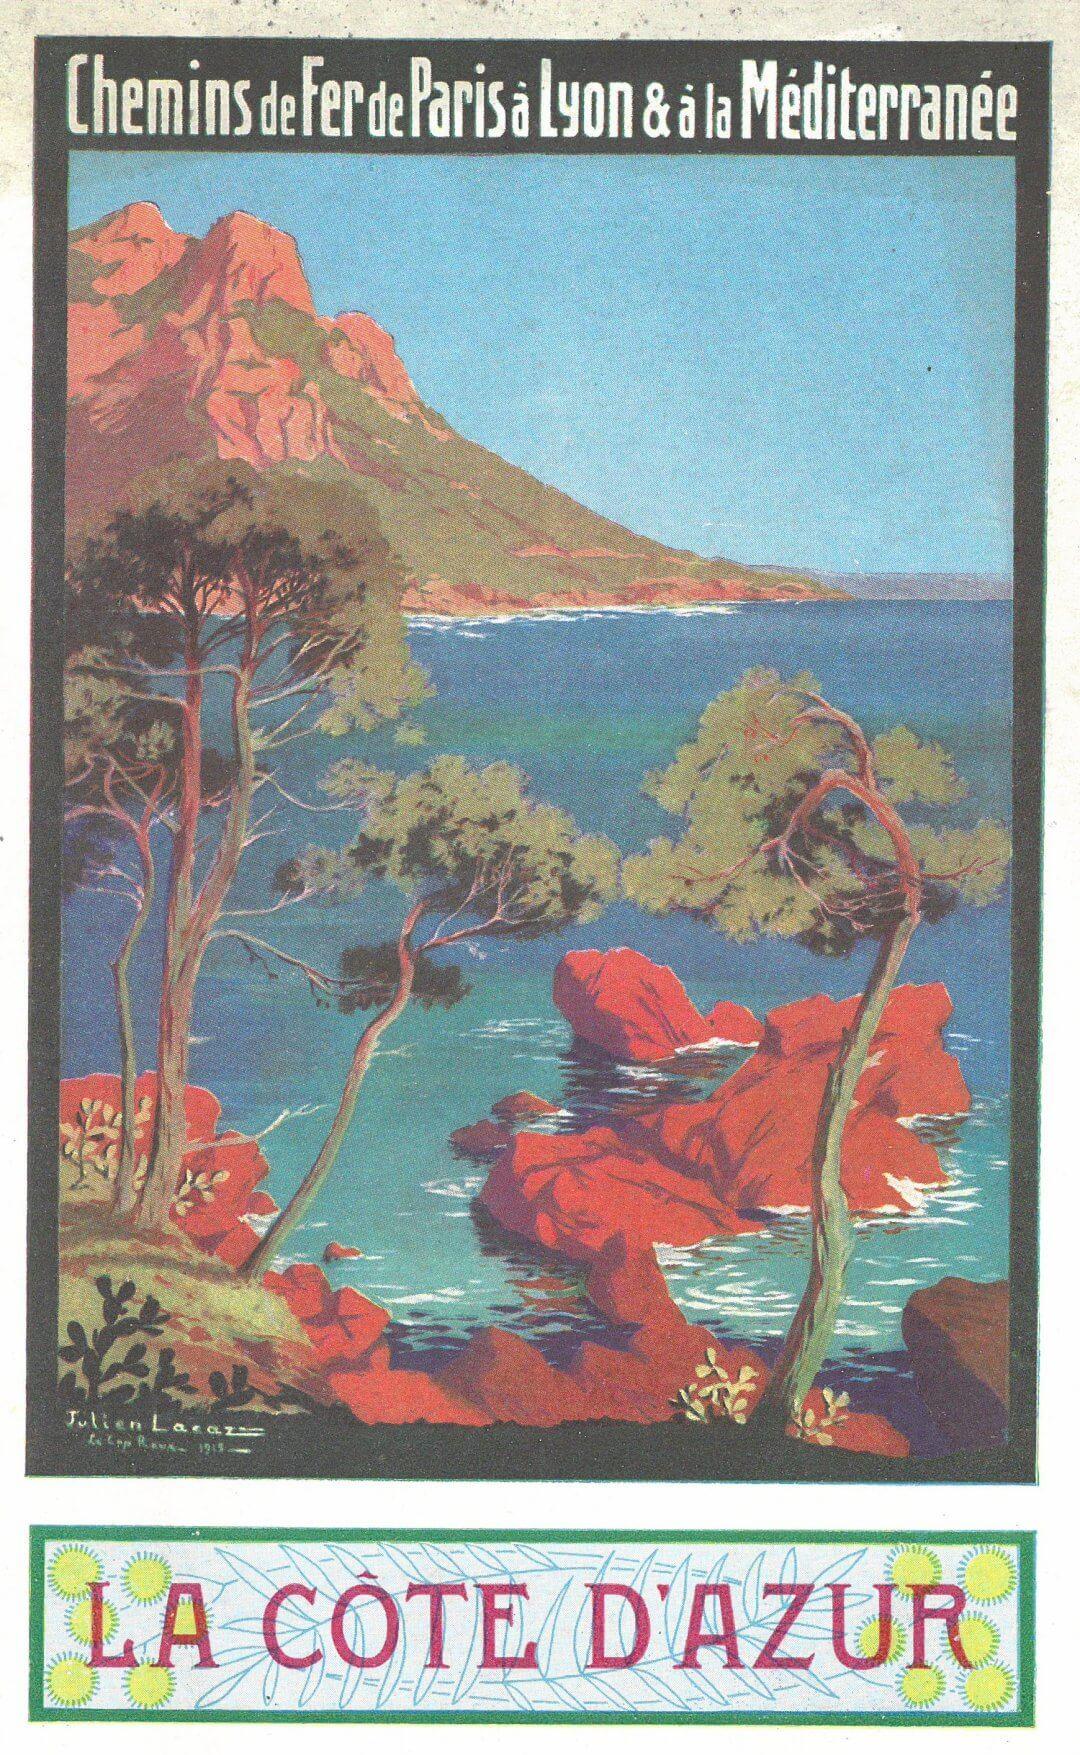 PLM French Riviera Cap Roux